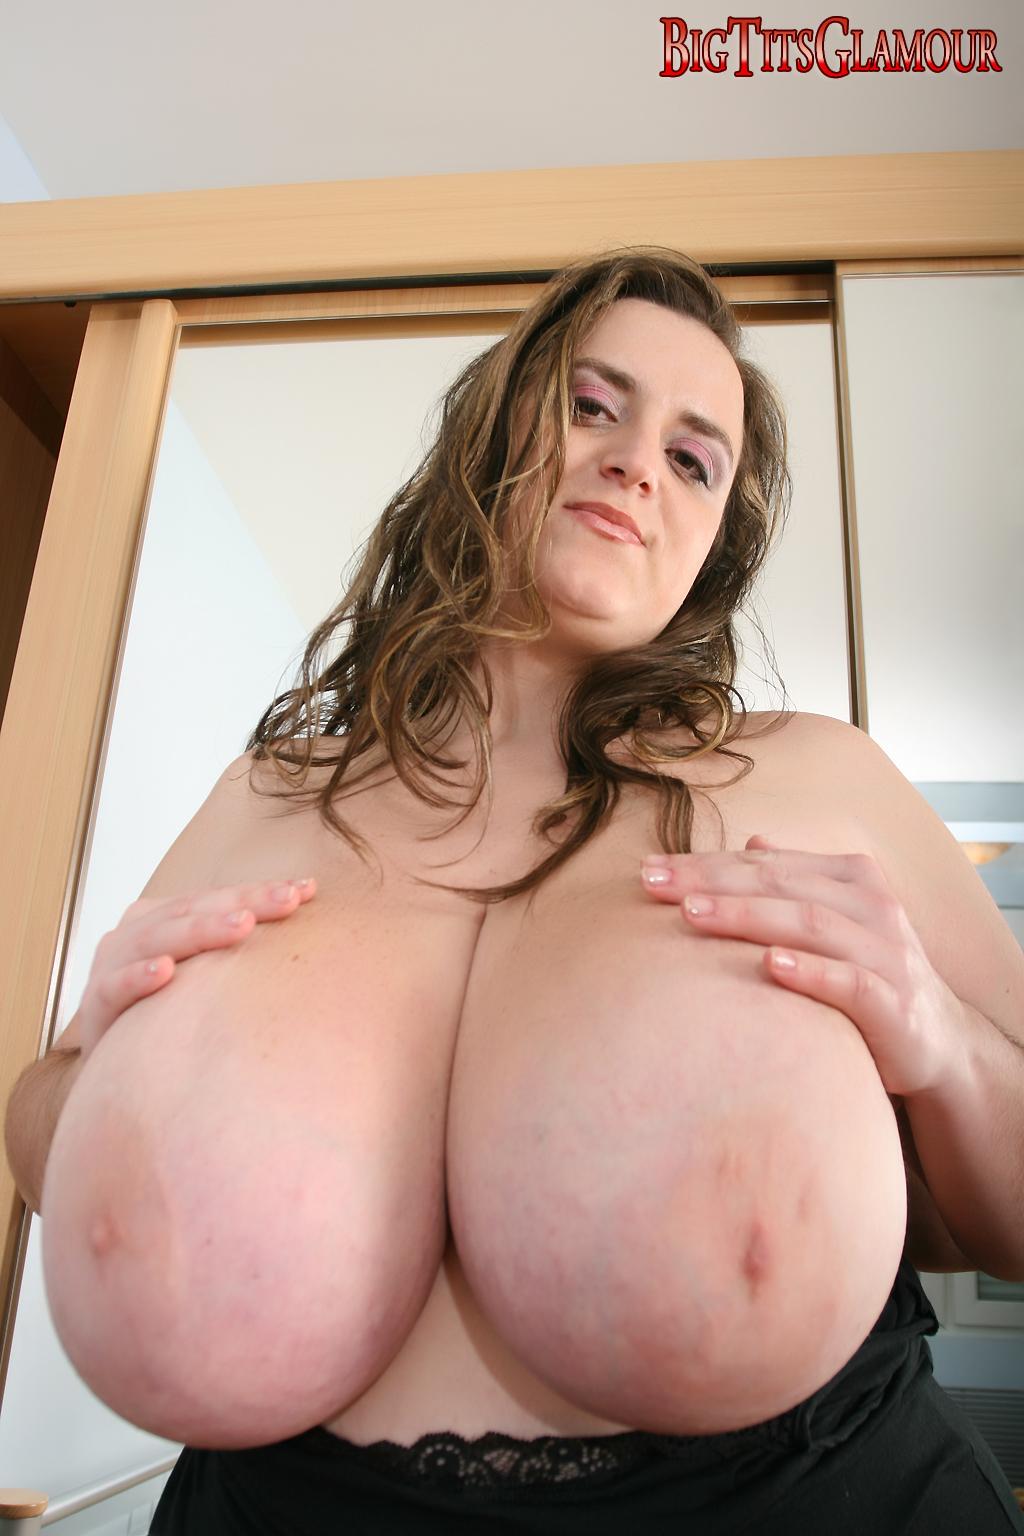 Bbw Huge Boobs Mom Porn anna love bares all as boobs40k at imlive | my boob site